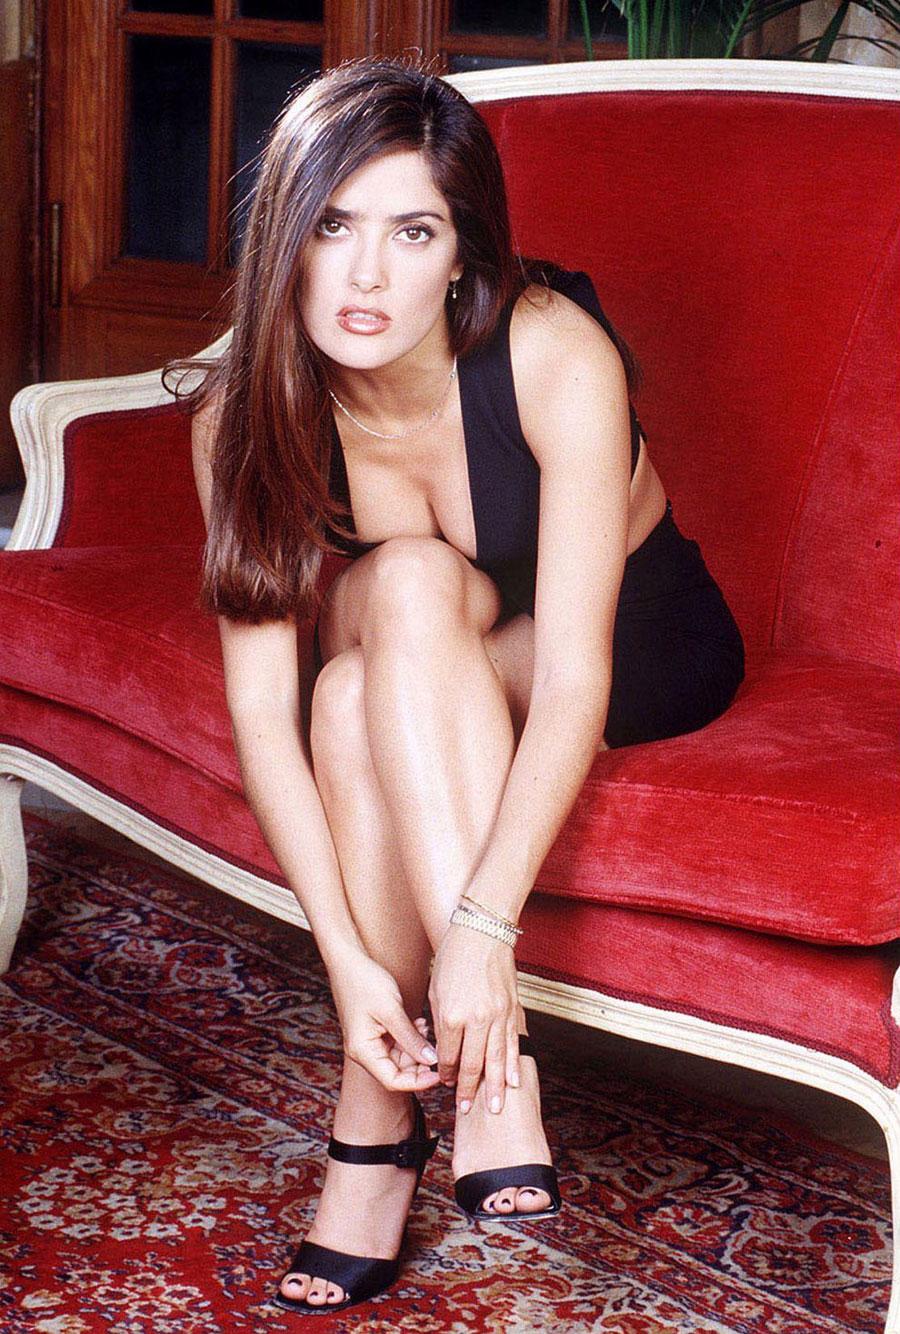 Feet Alena Vodonaeva nude photos 2019